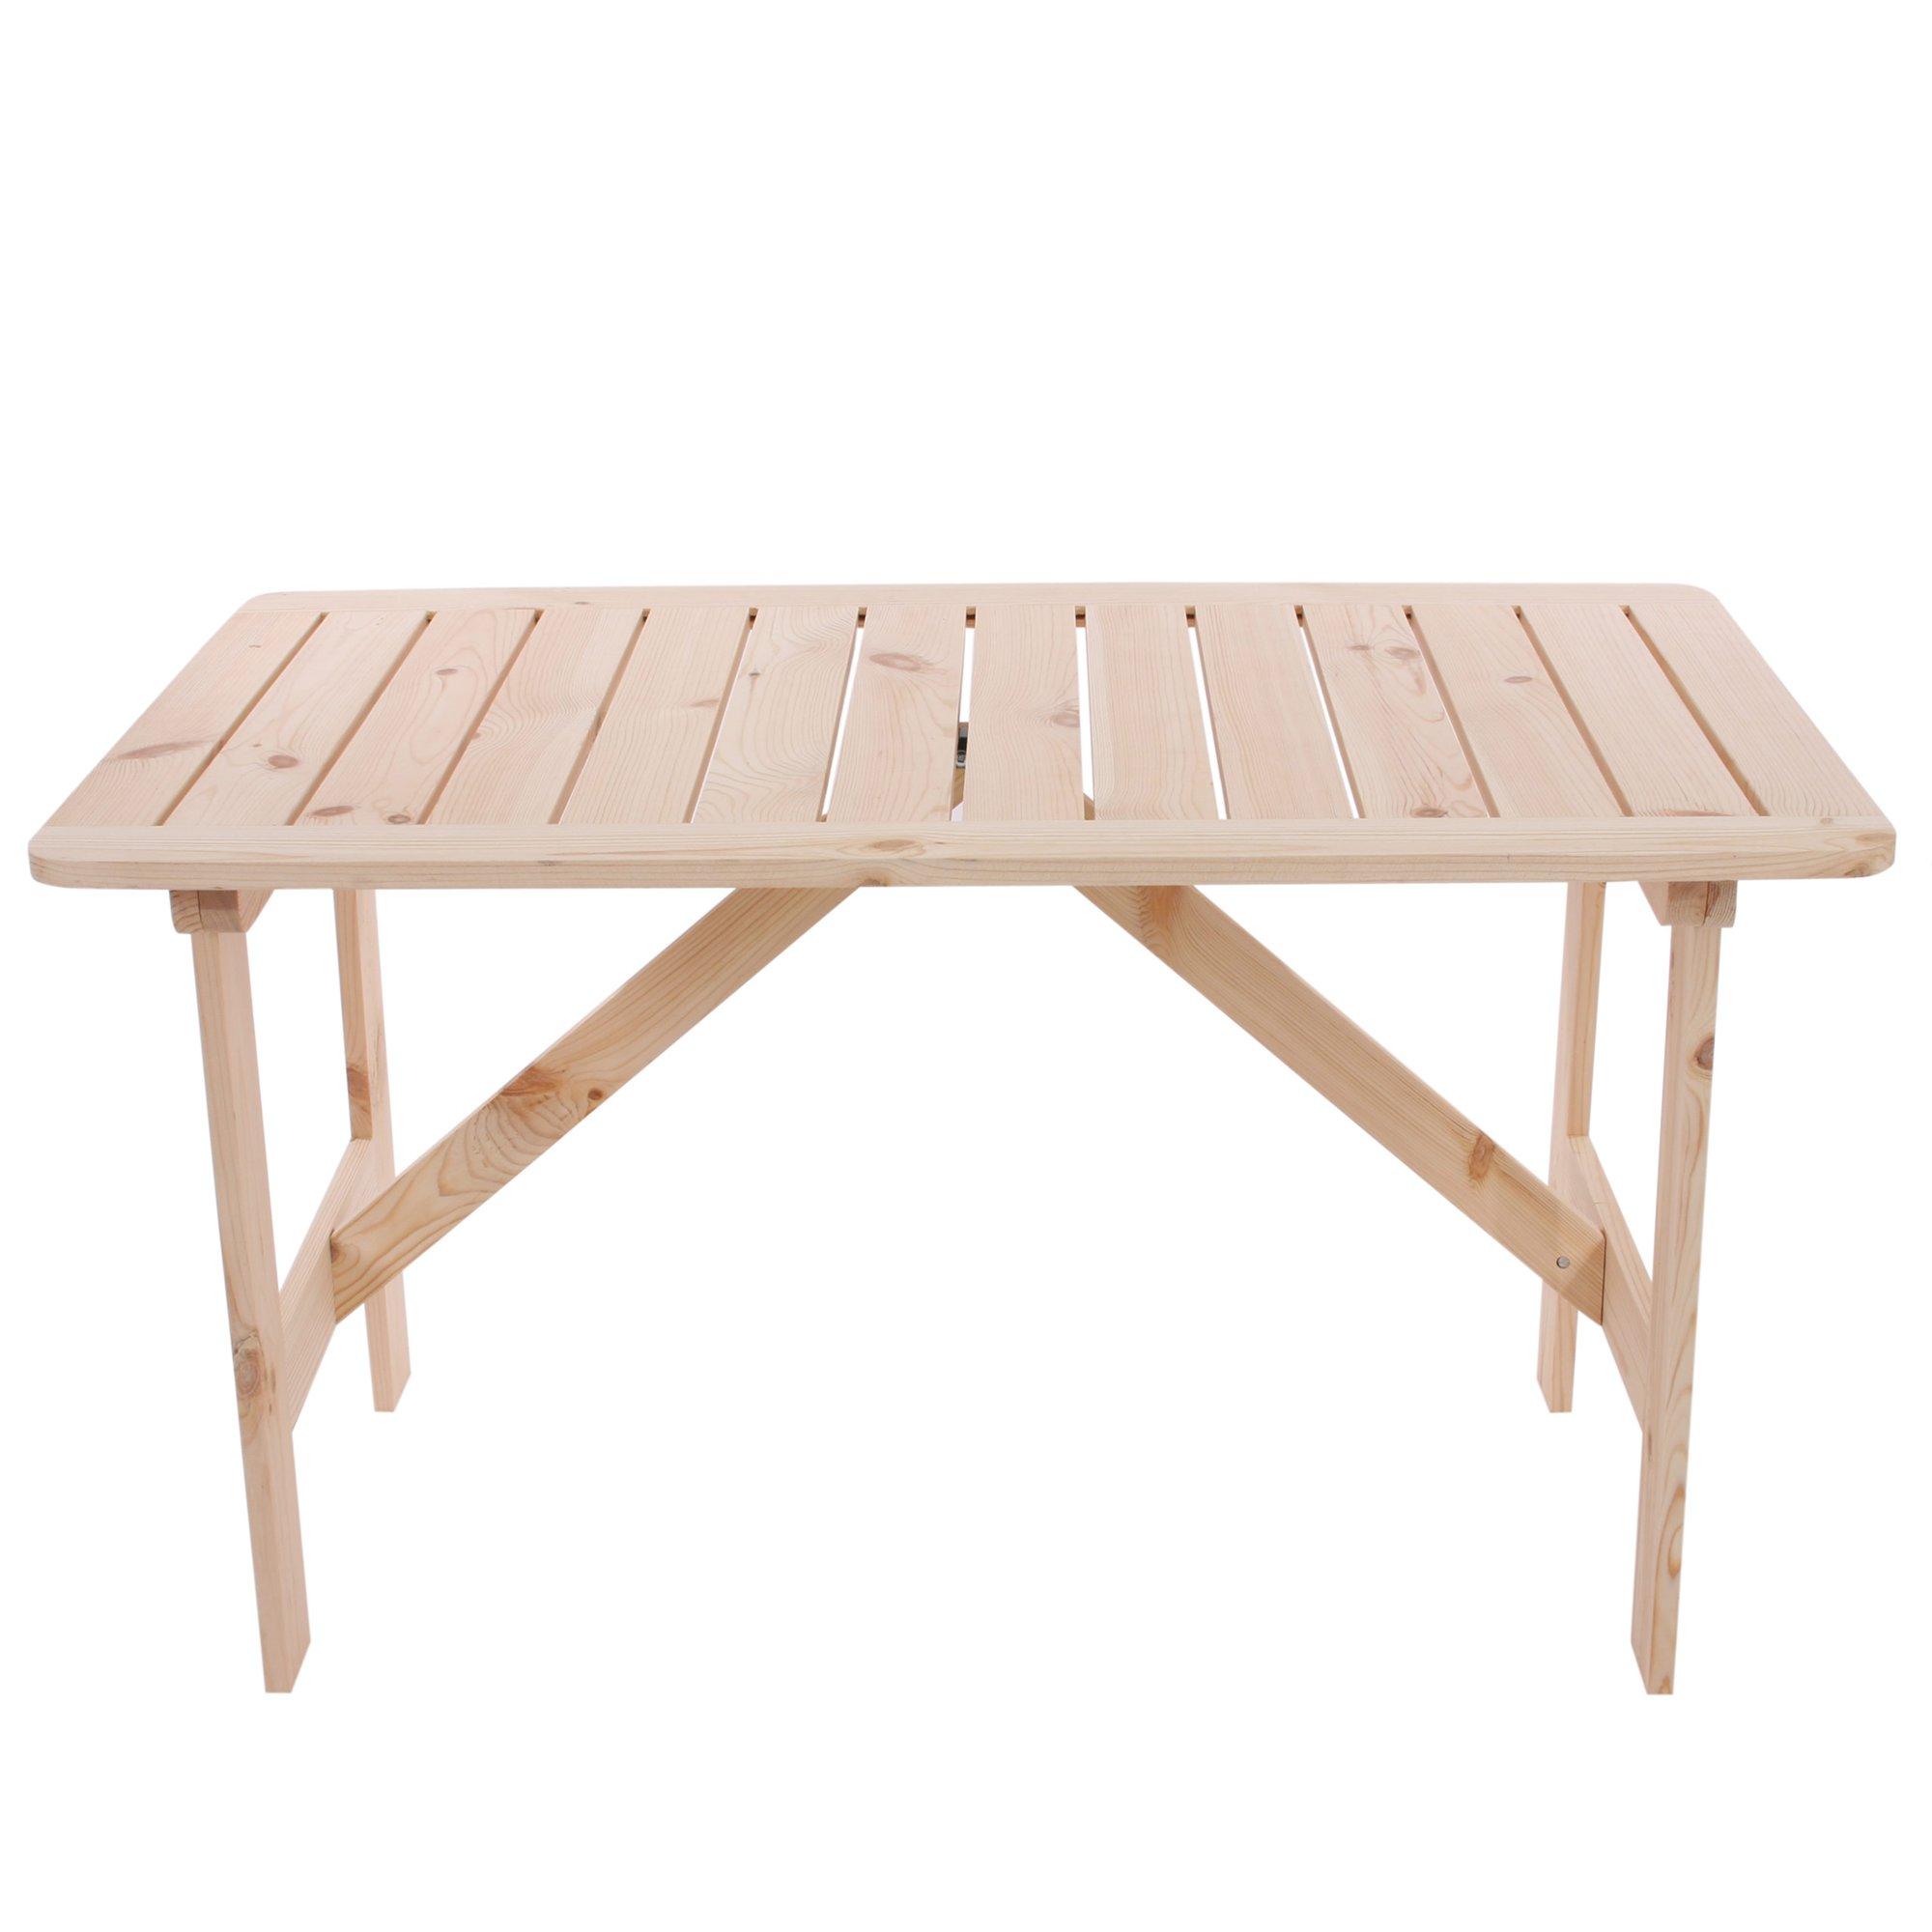 Mesa de jard n o terraza copenhaguen en madera 130 x 80 for Galpon de madera para jardin